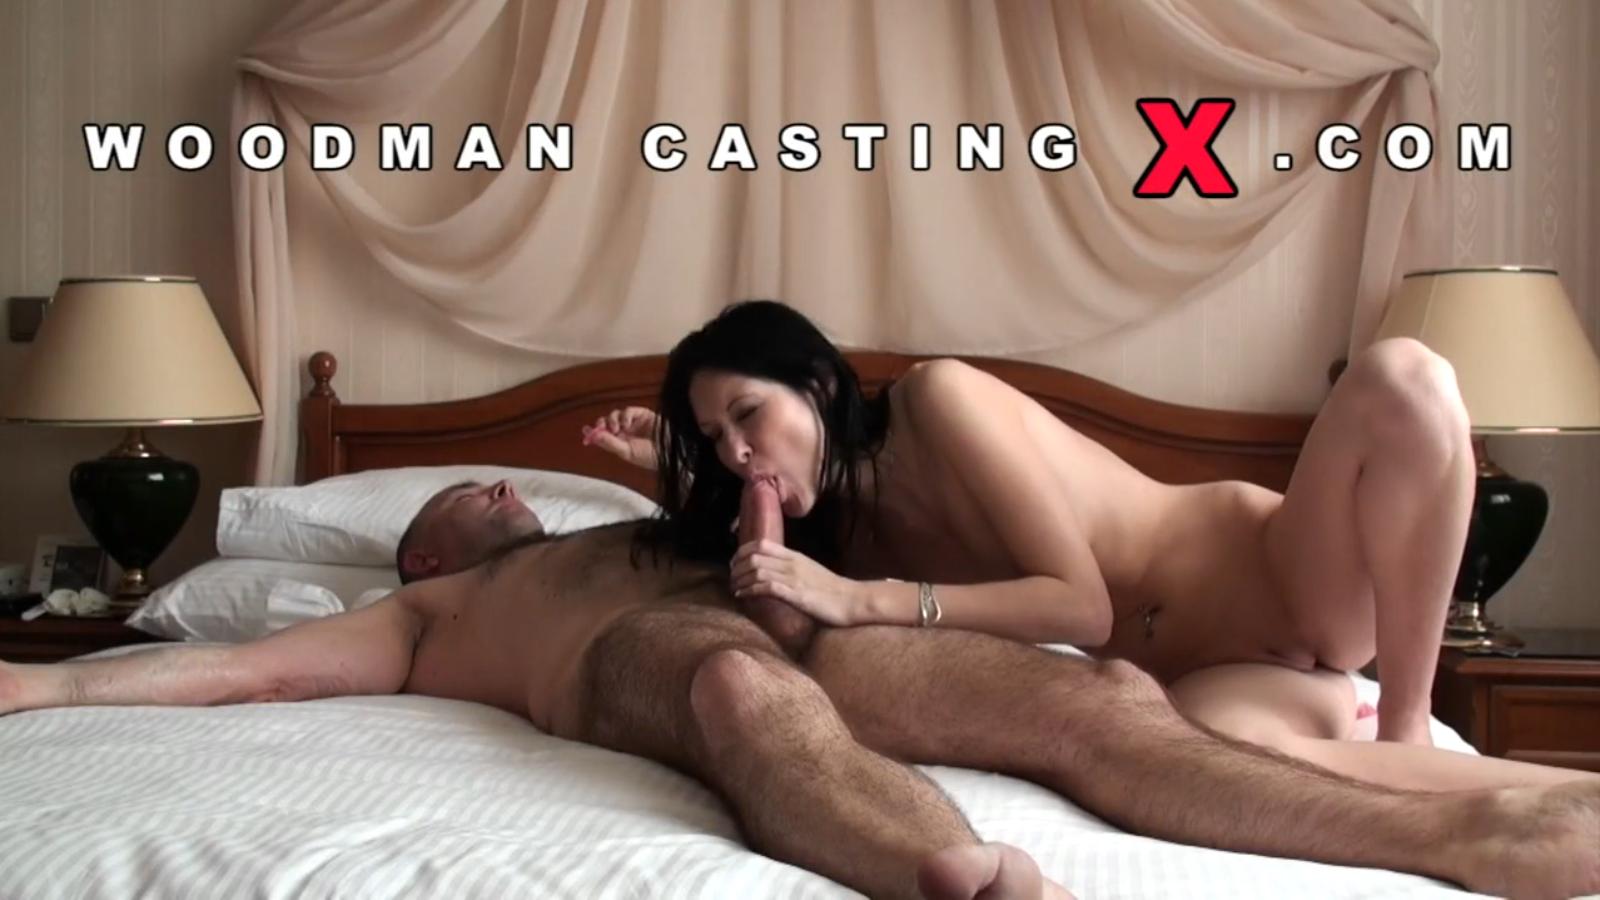 Woodmann casting com